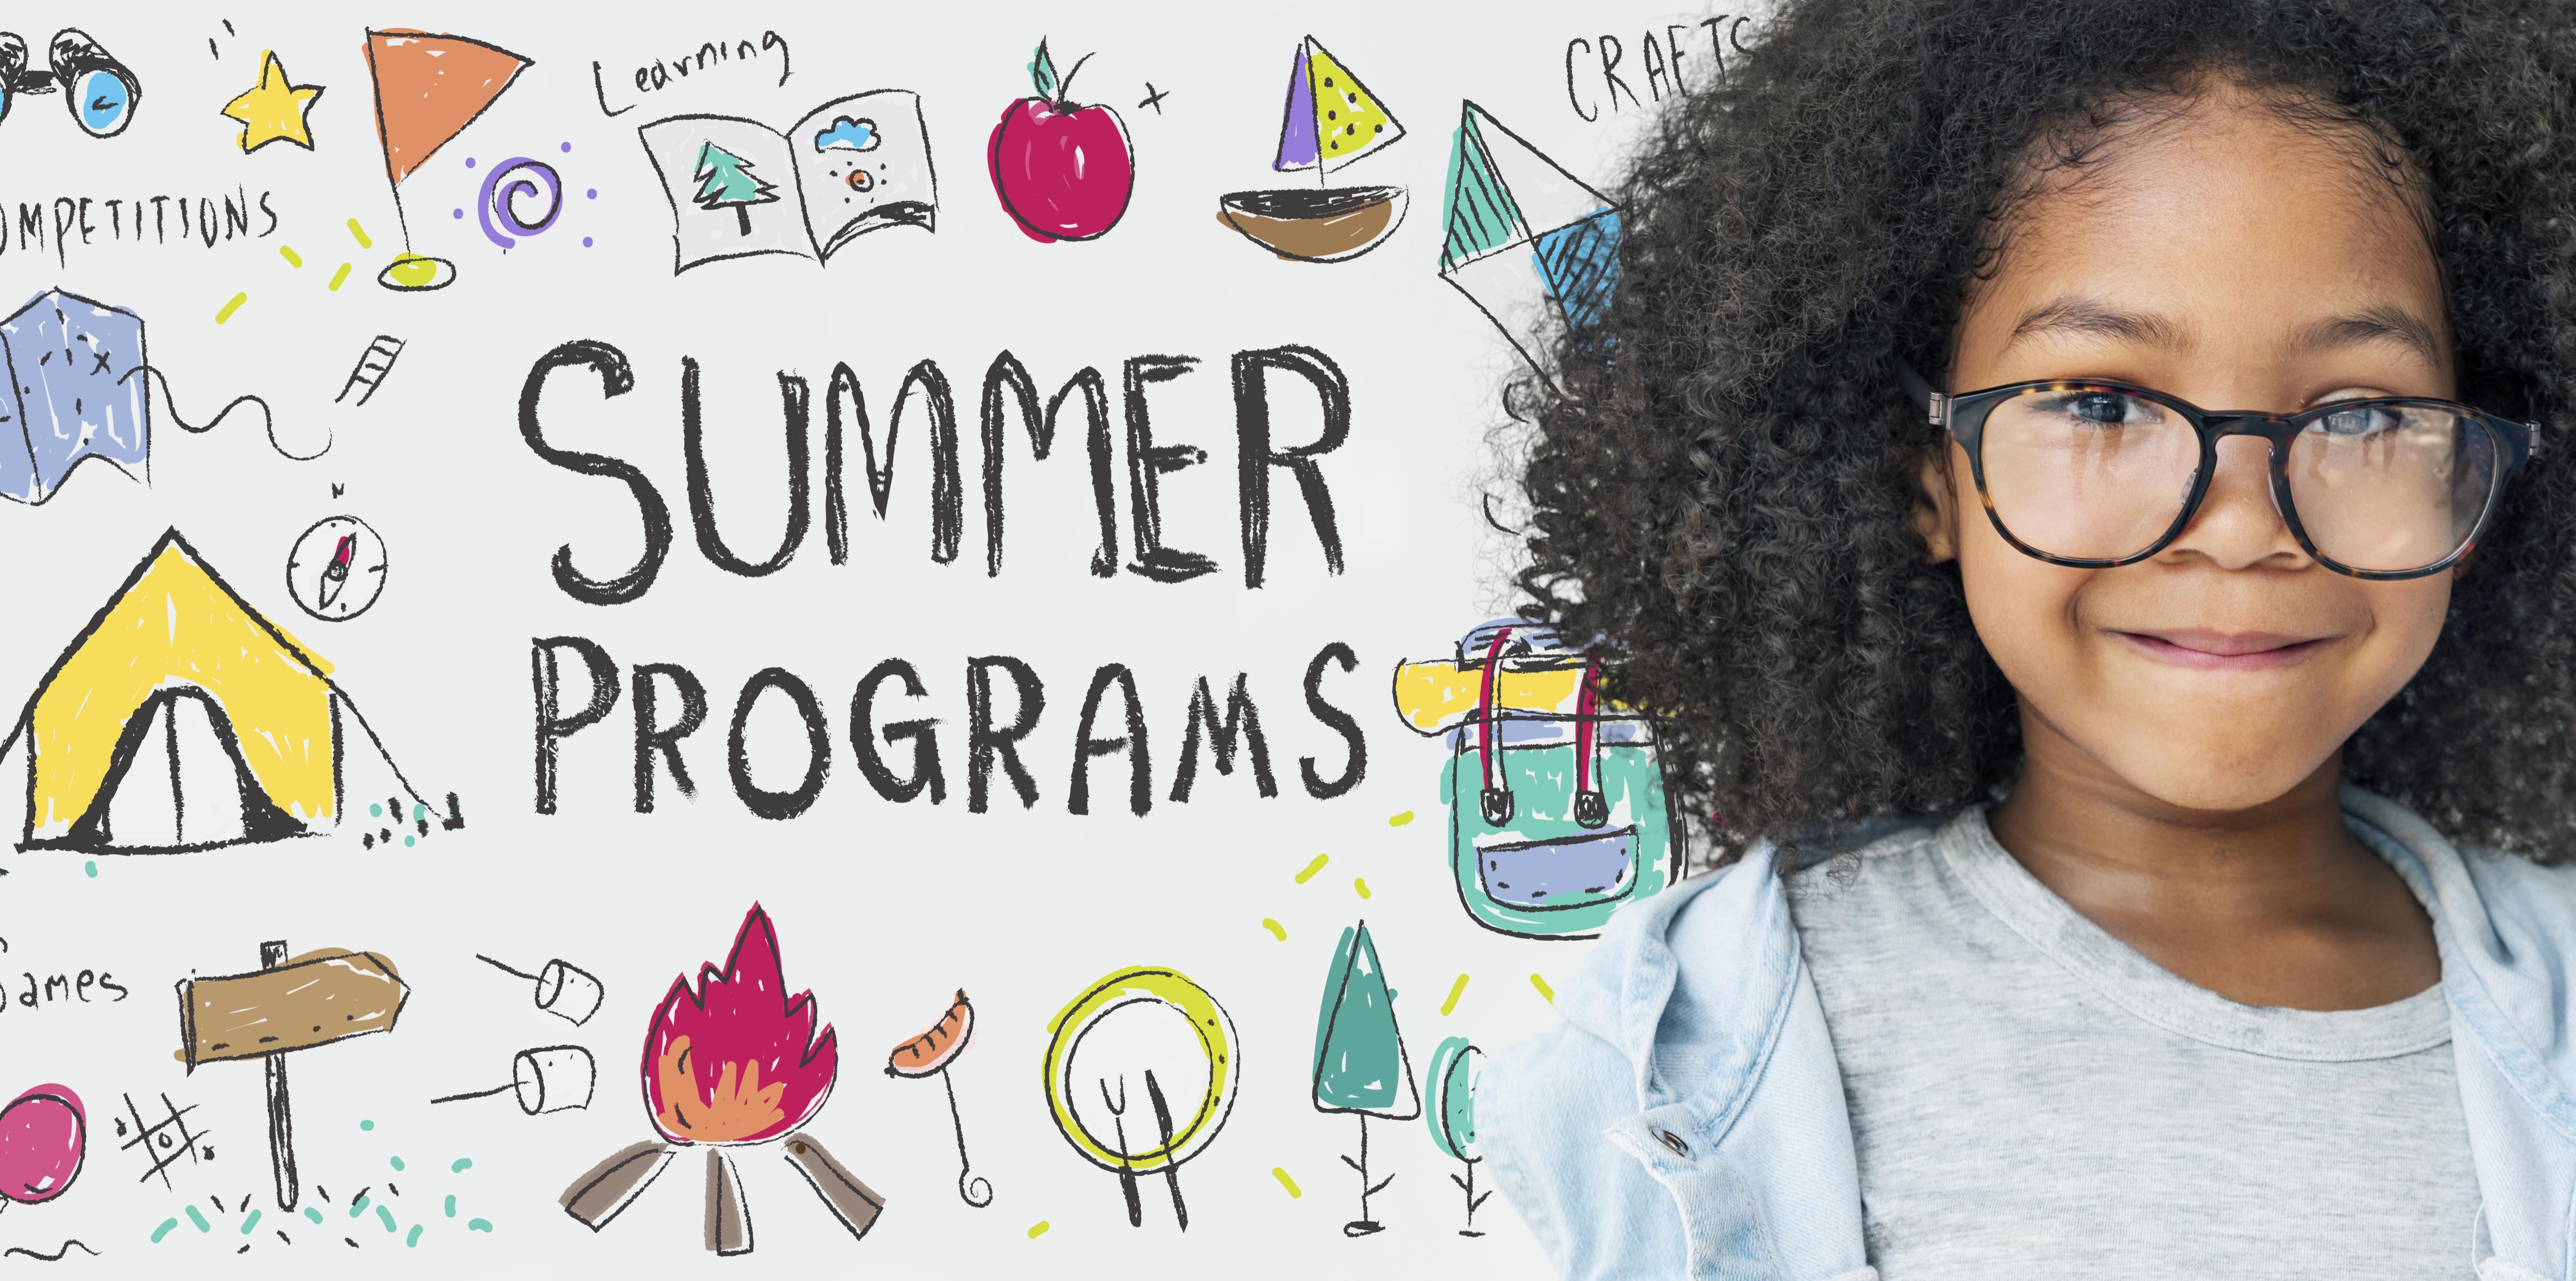 Summer Programs Image